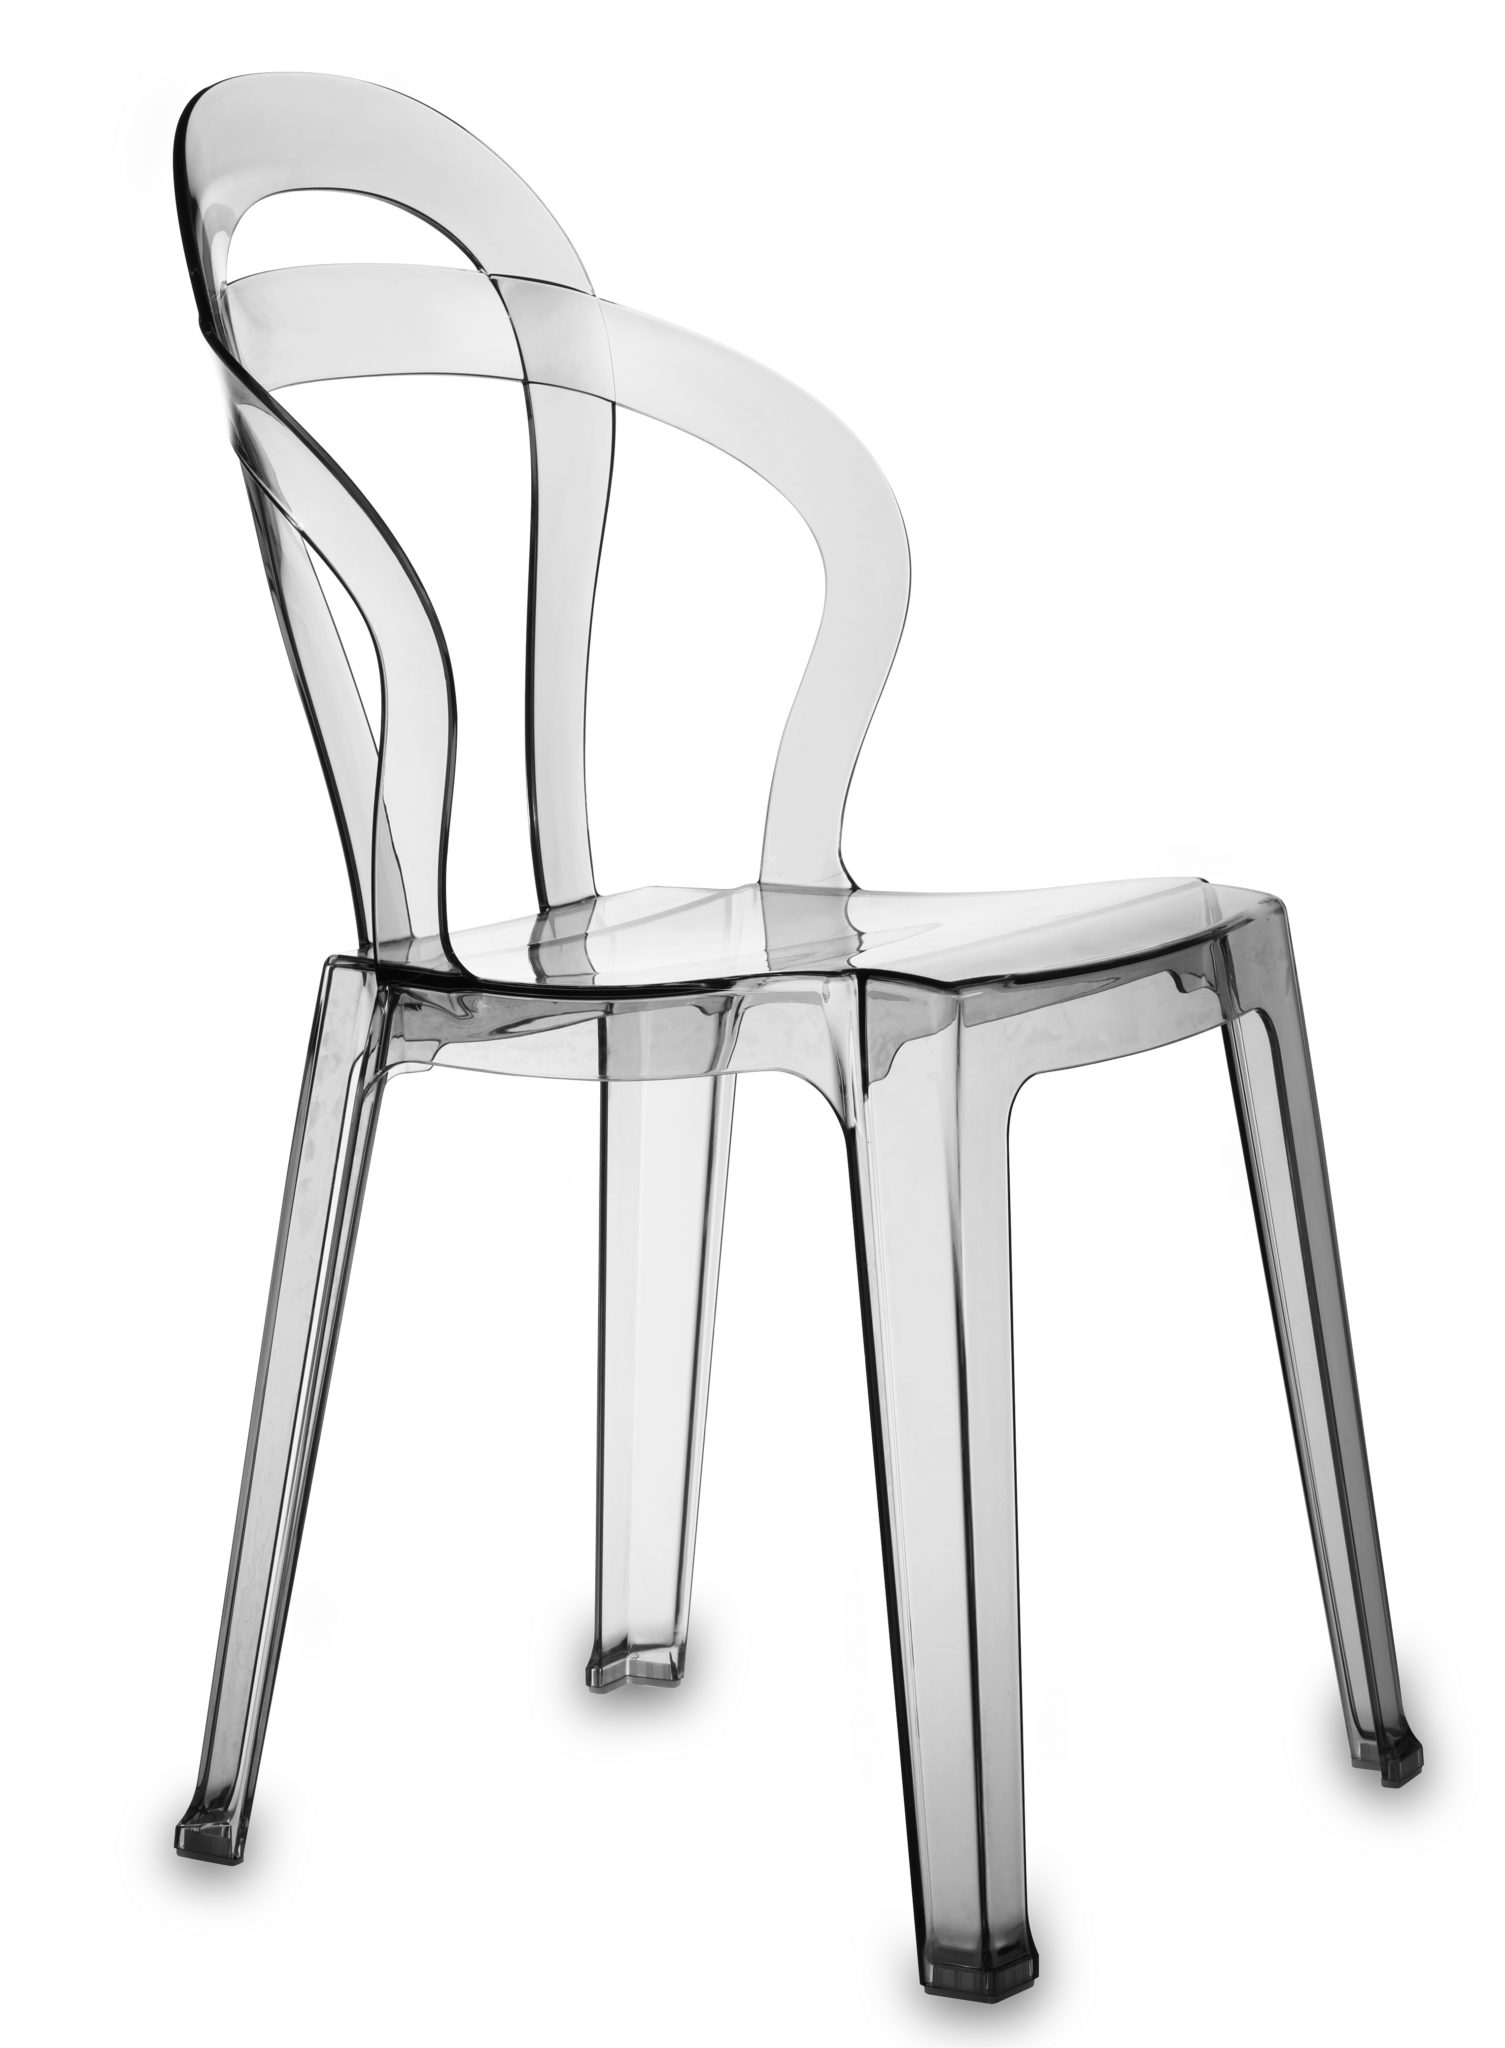 Design Tavoli E Titì Linea Sedia Scab Sedie zUVpGSqM